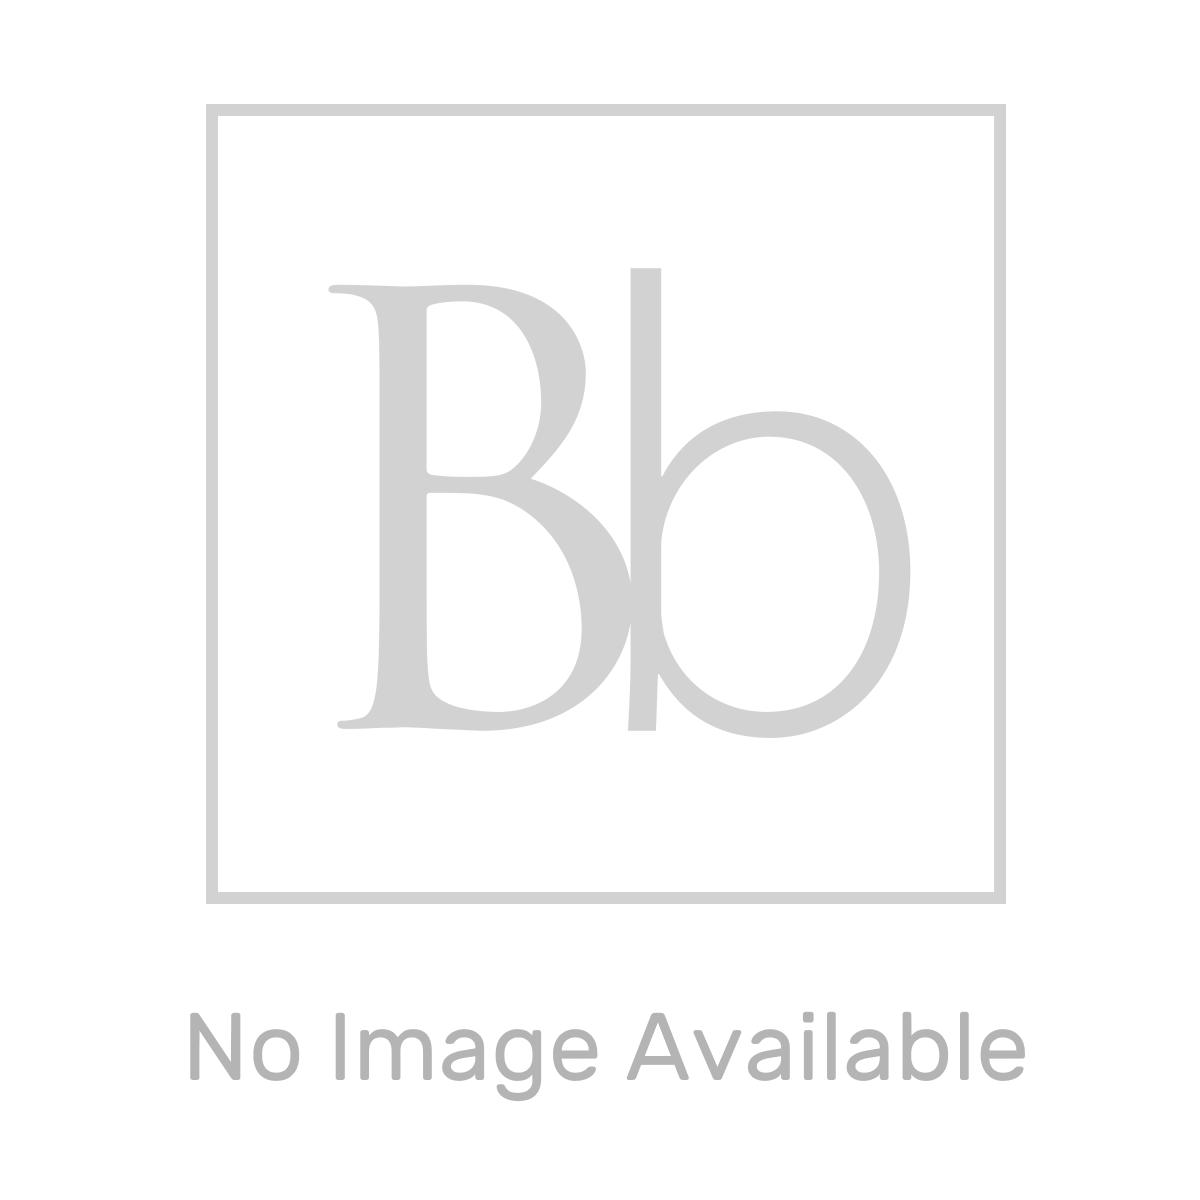 Aquadart White Slate Shower Tray 1000 x 900mm